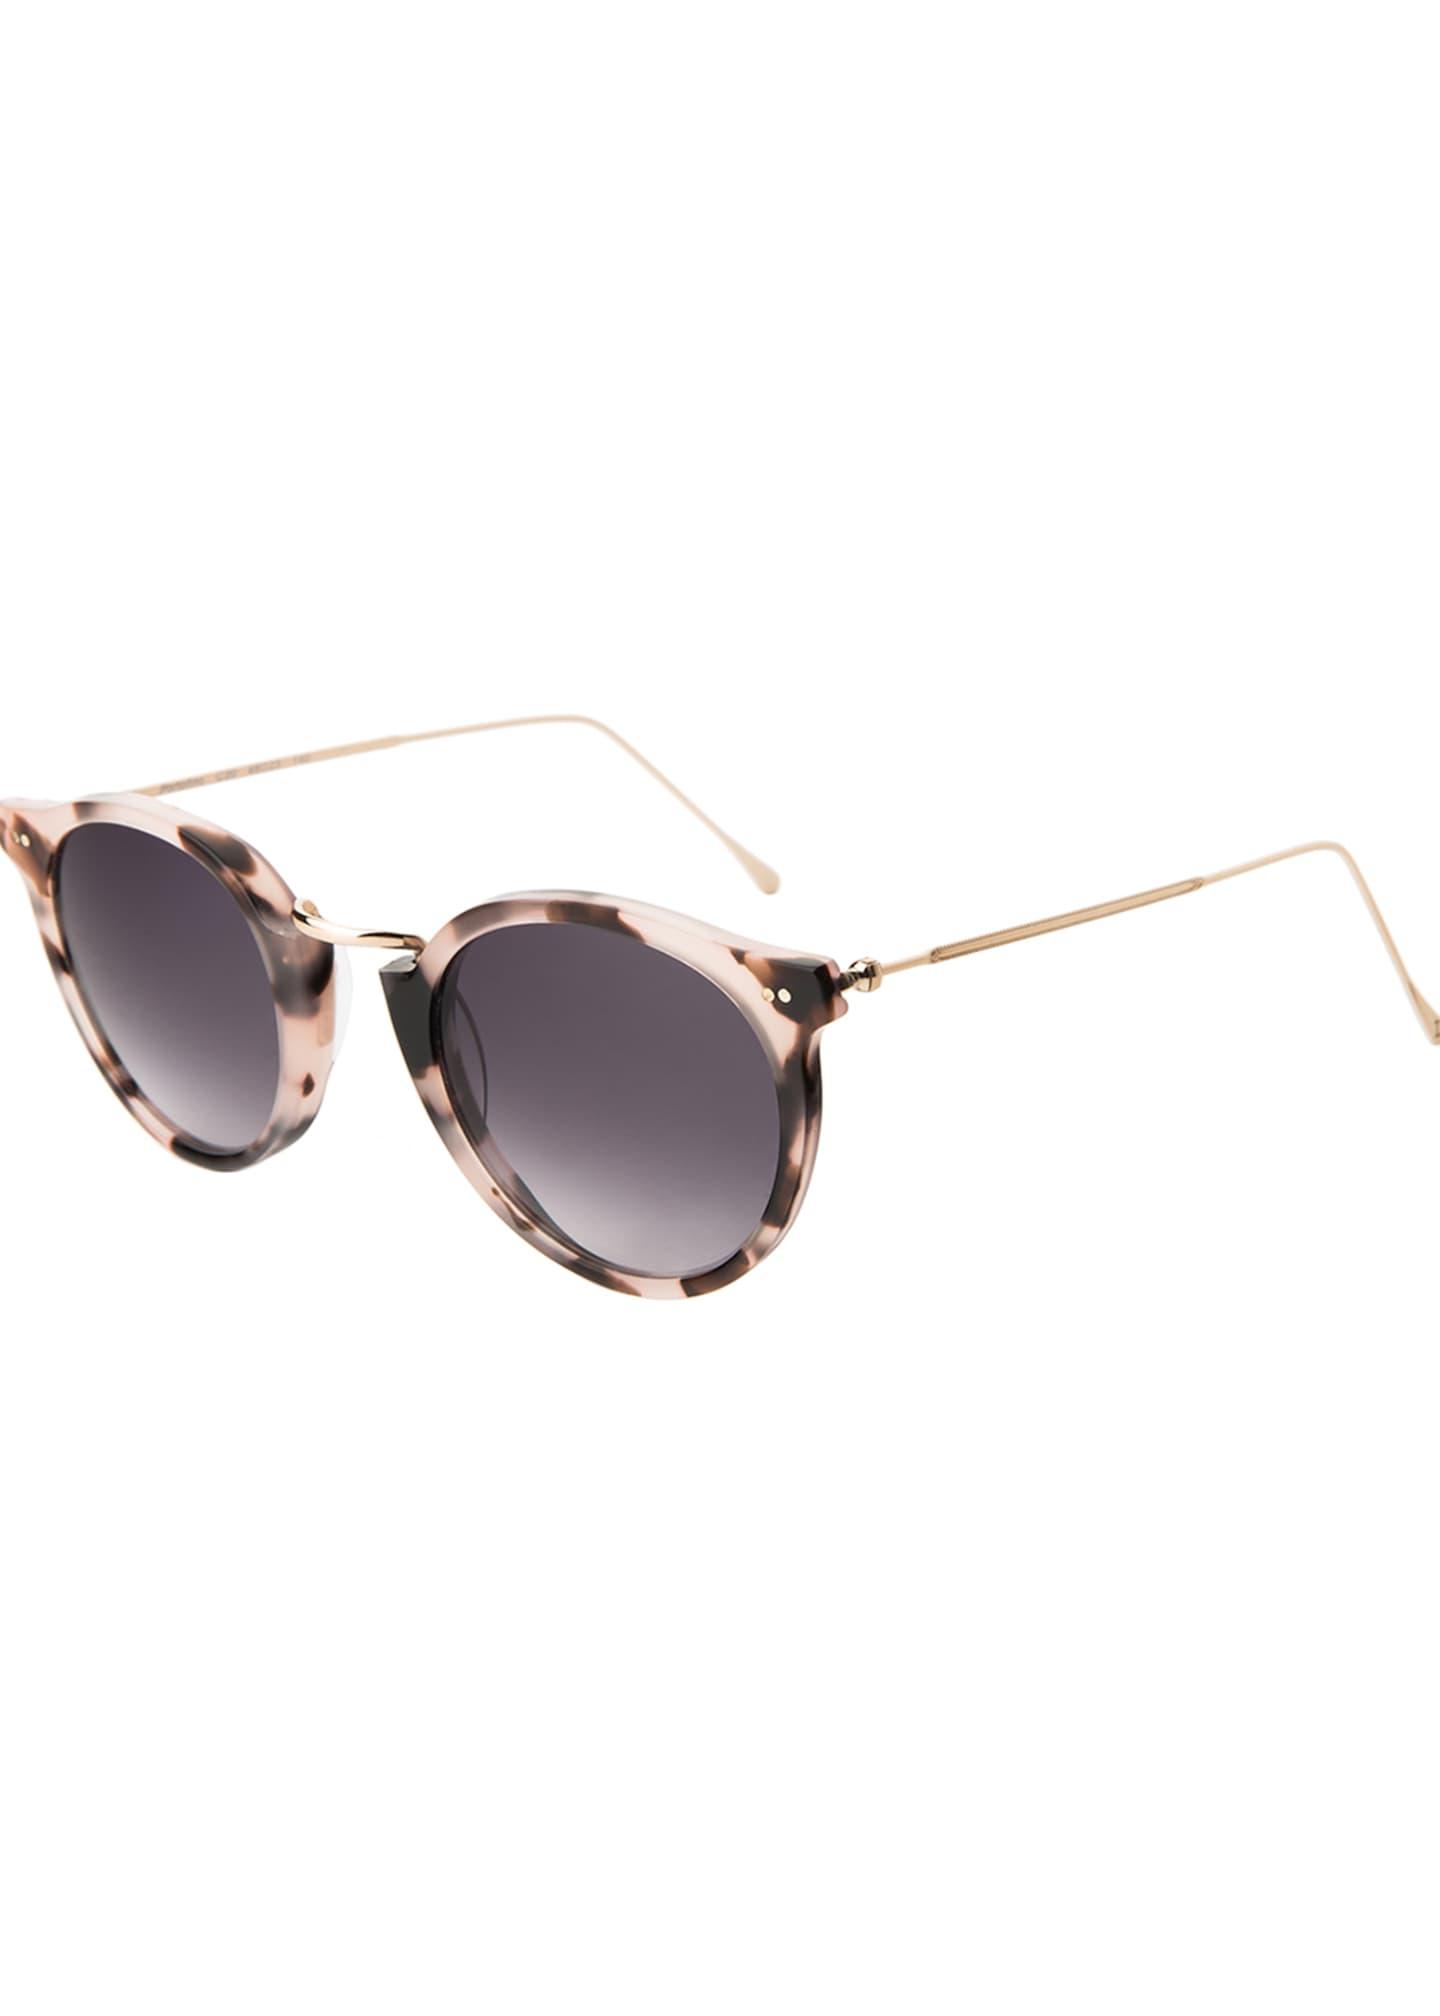 Illesteva Round Acetate & Steel Monochromatic Sunglasses